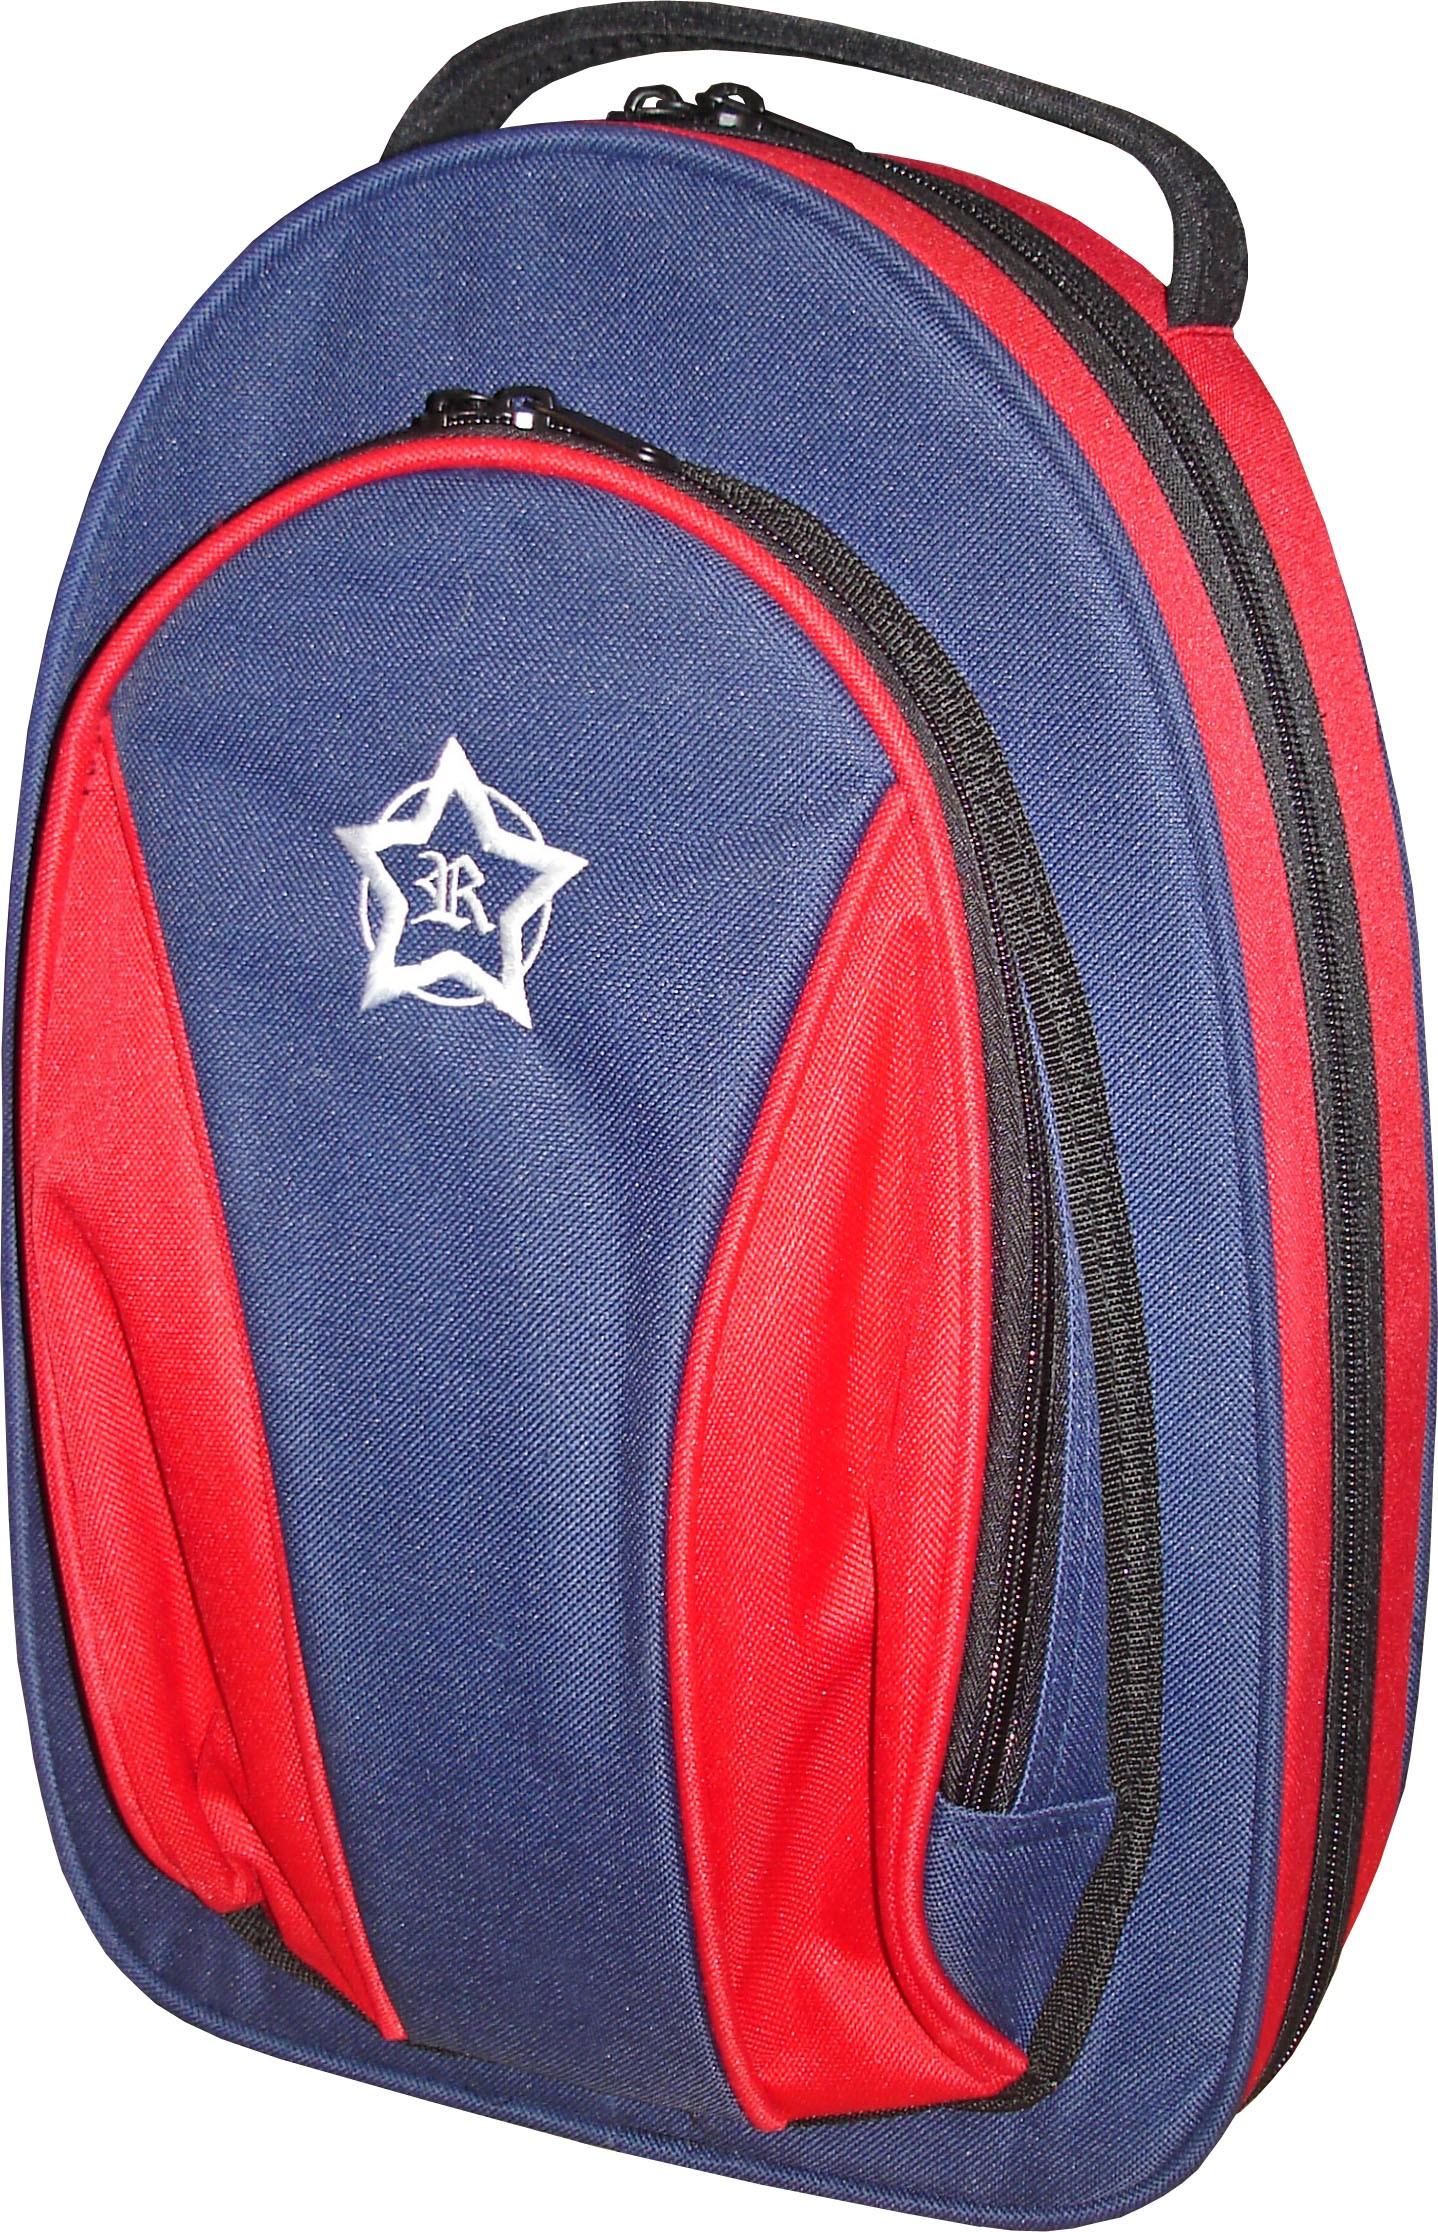 Rosetti Clarinet Bag - Red/Blue